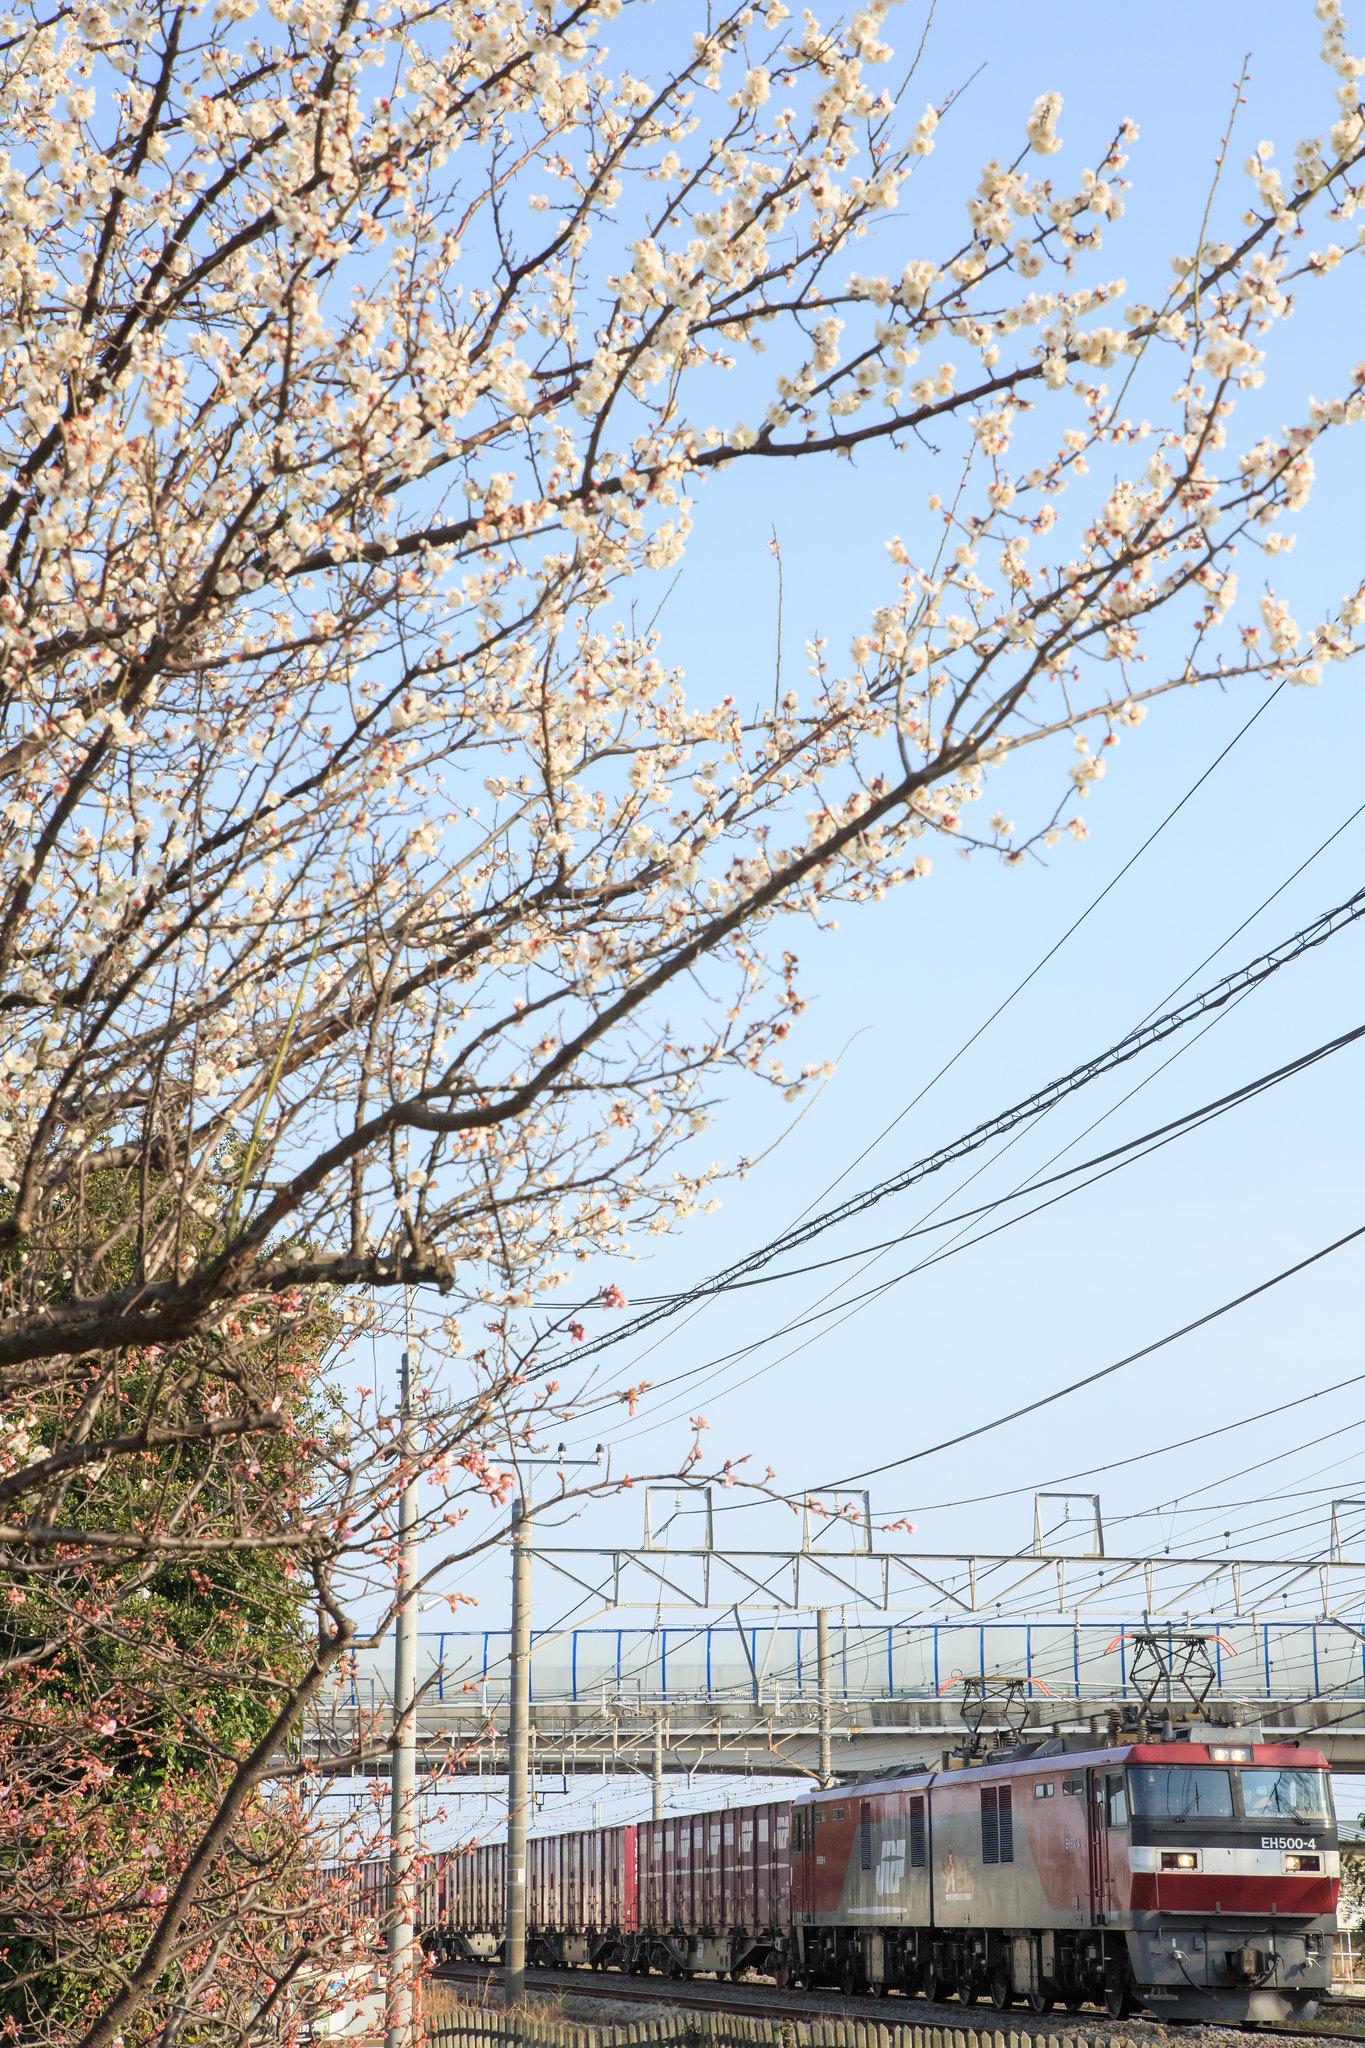 EH500 4 / Tokaido Line